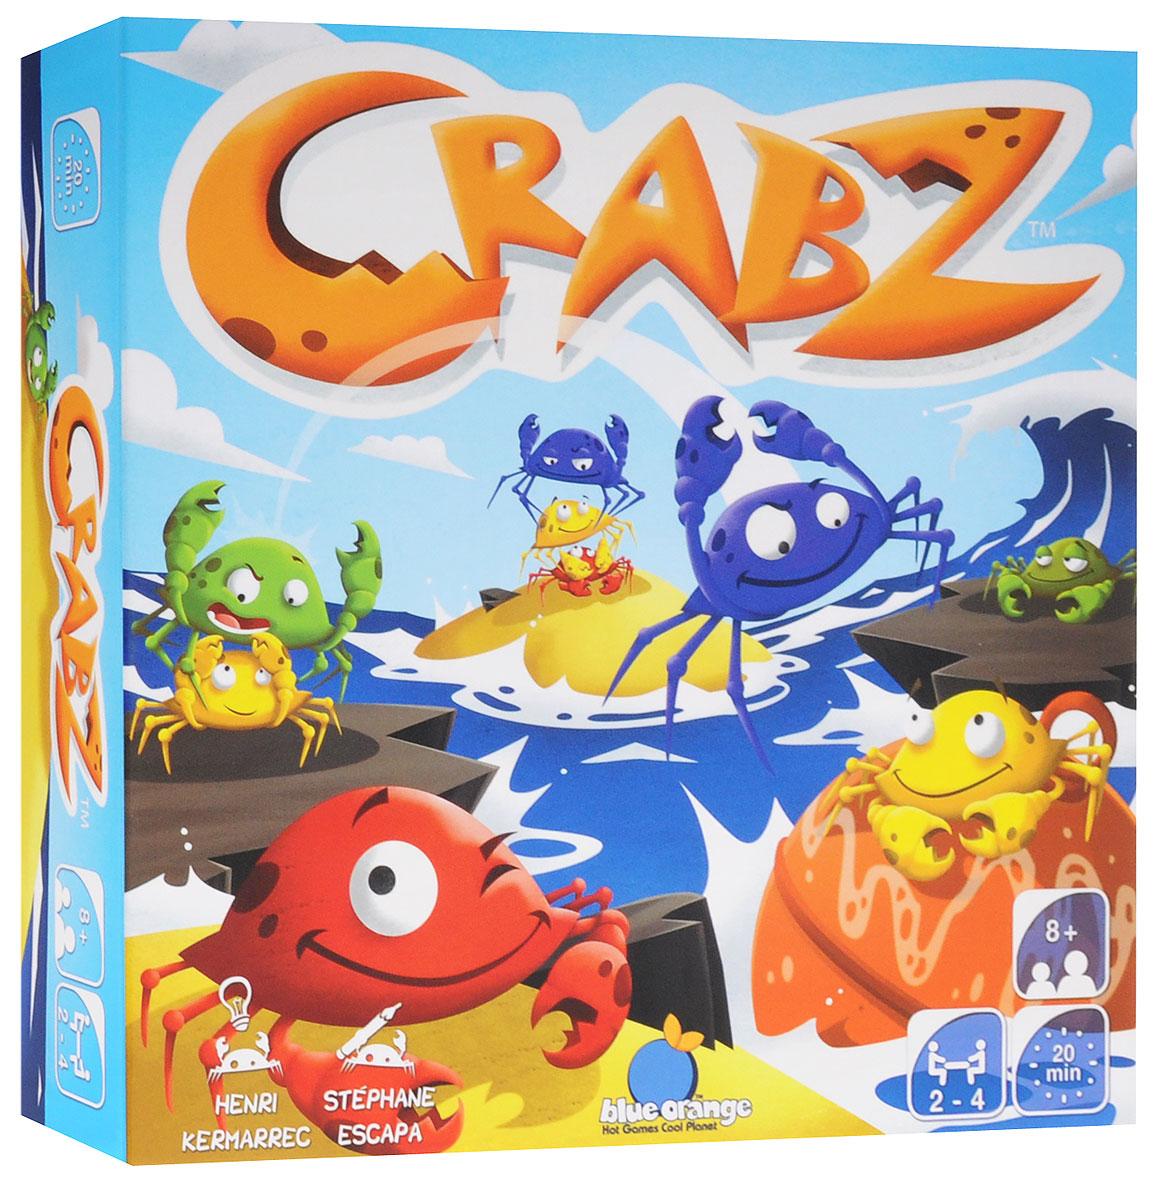 Blue Orange Настольная игра Крабы blue orange настольная игра крабы